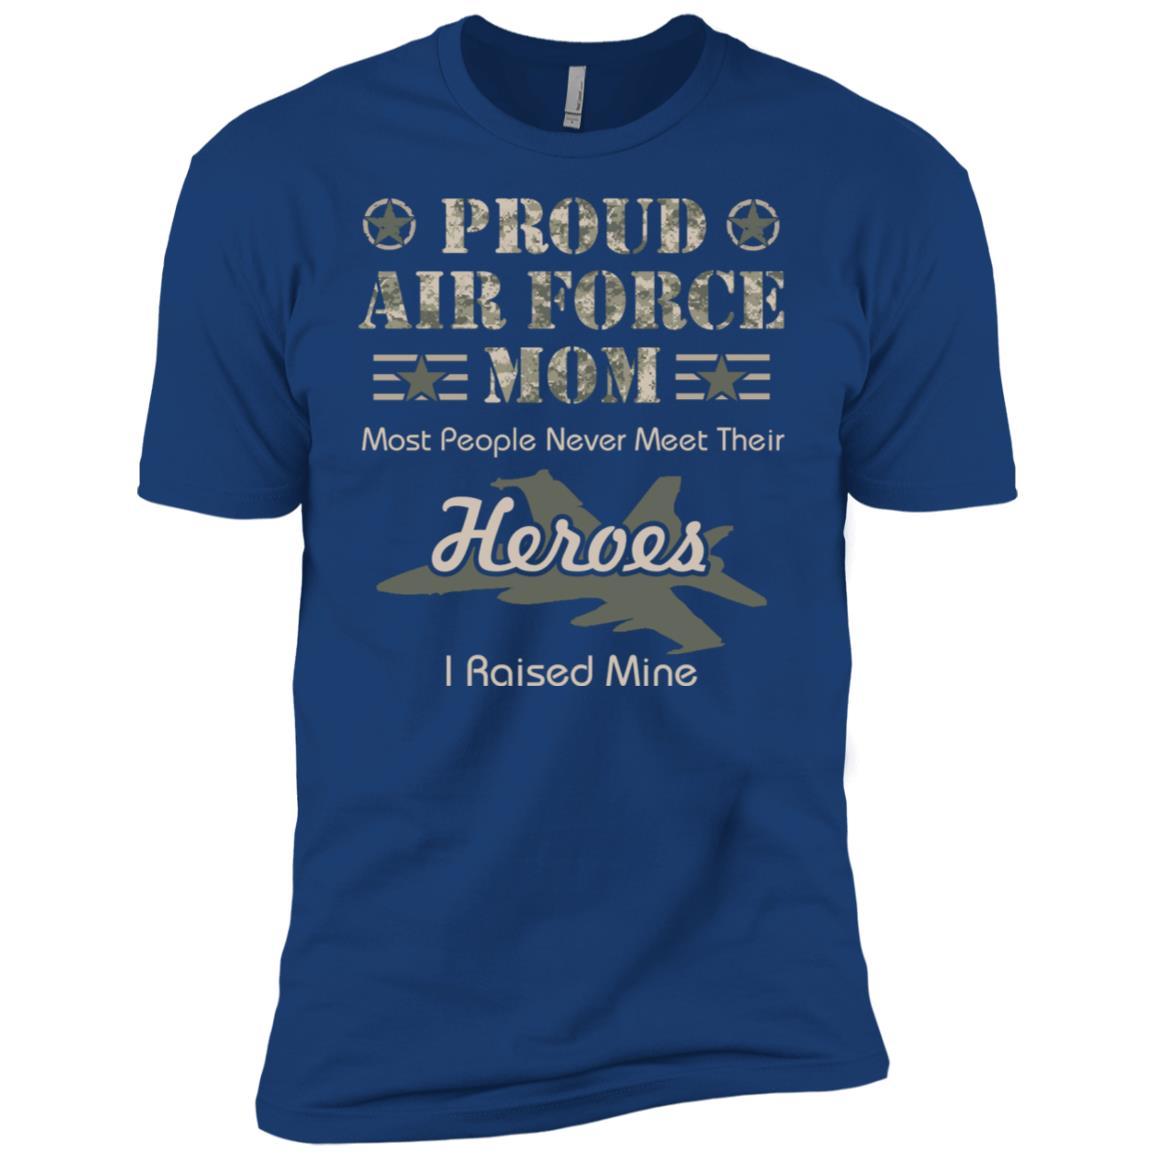 Proud Air Force Mom Men Short Sleeve T-Shirt